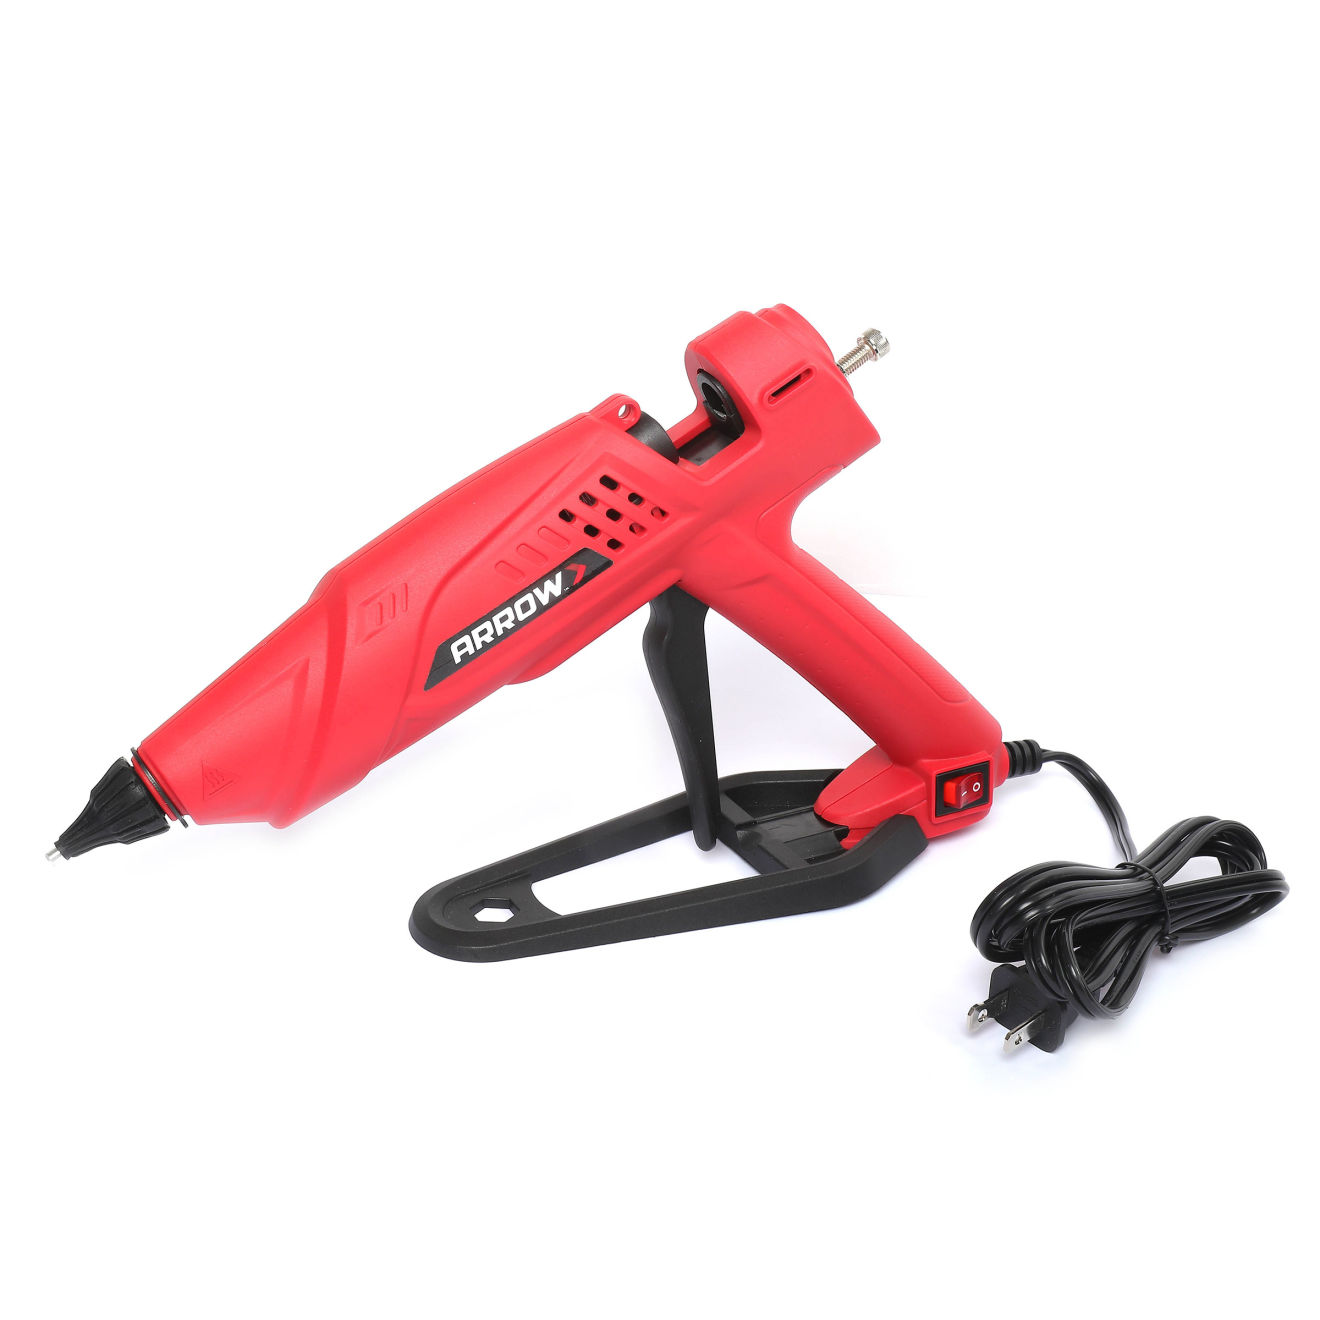 Arrow GT300 Professional High Temp Glue Gun